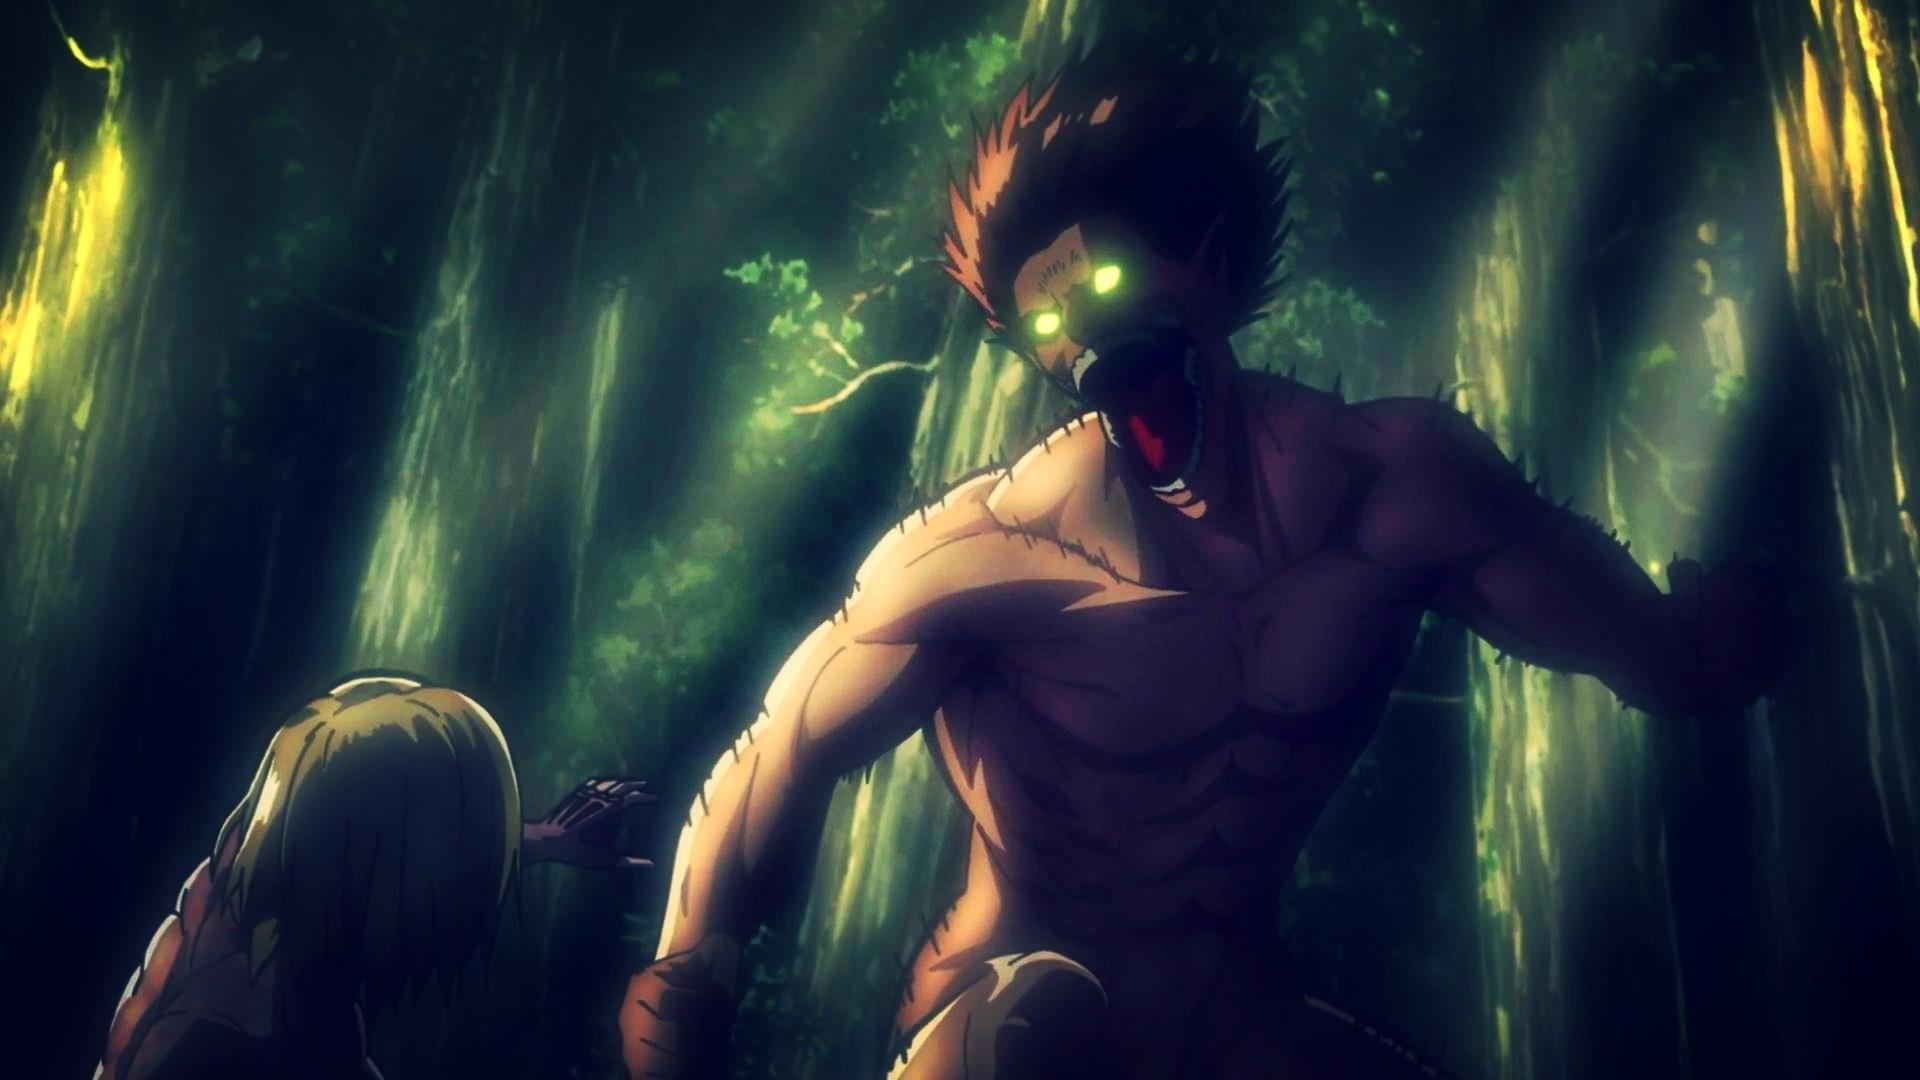 Anime – Attack On Titan Wallpaper